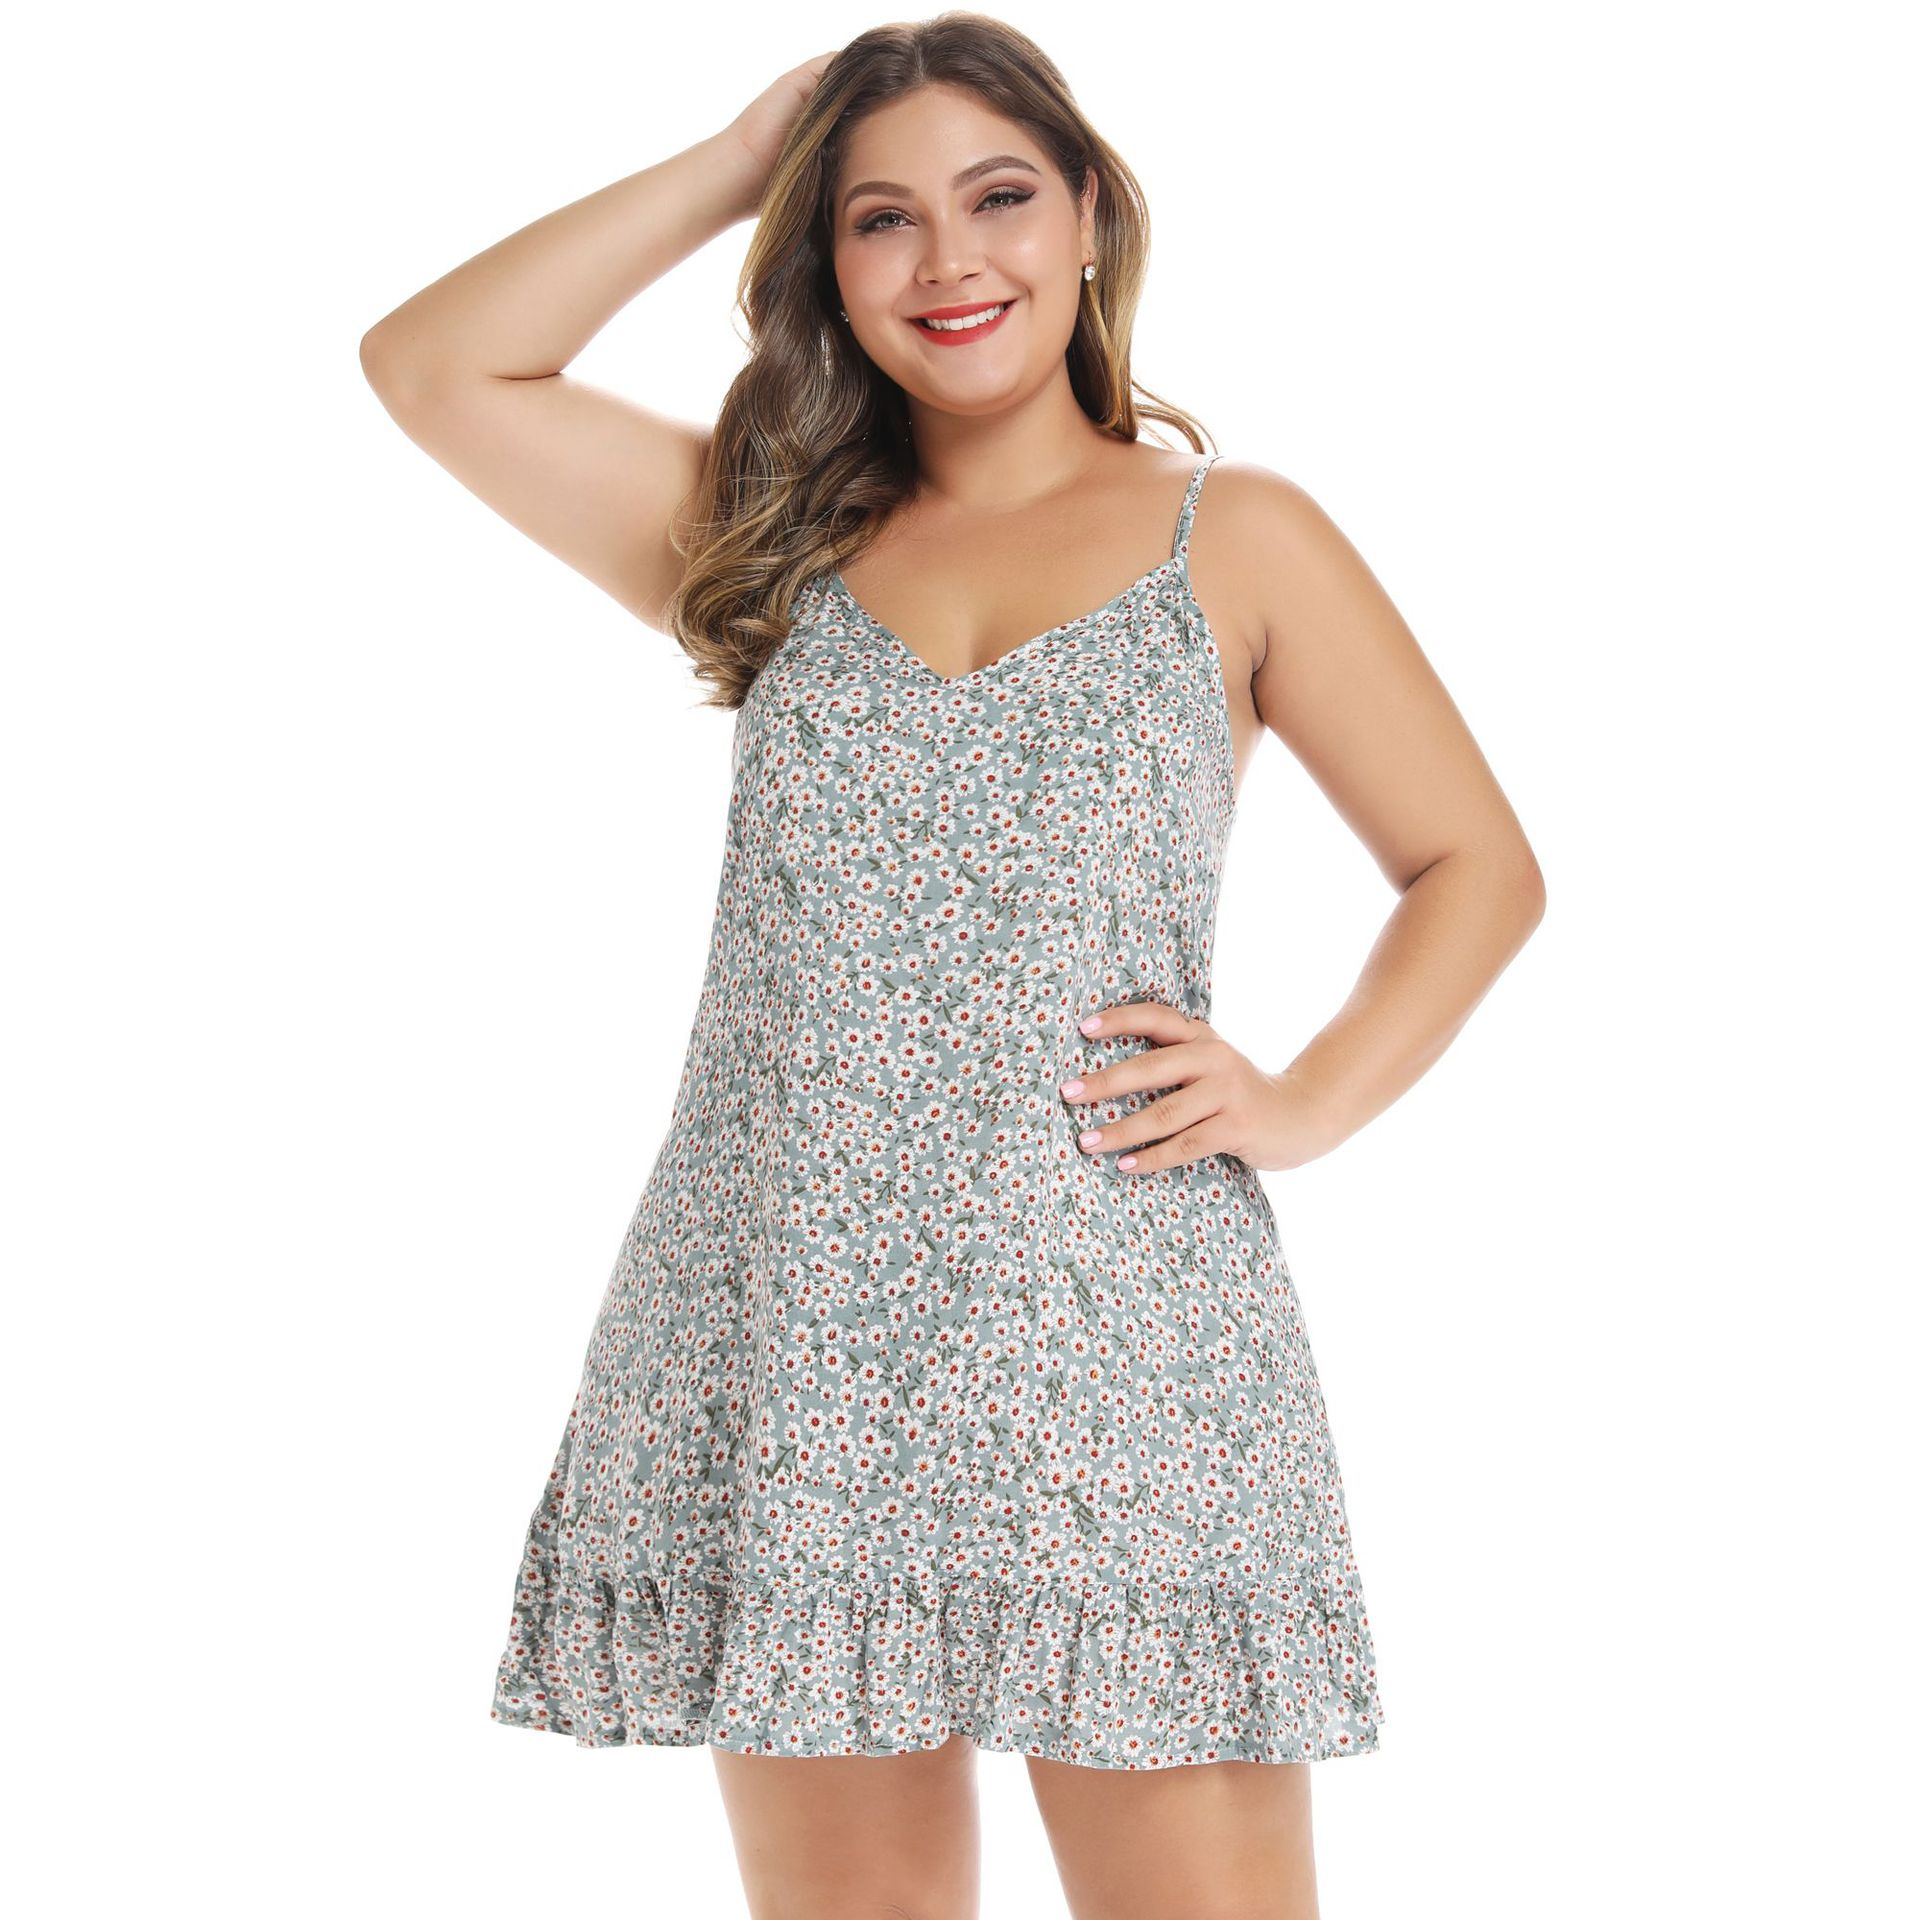 Plus Size Dress Elegant Summer Floral Print Spaghetti Strap Boho Mini Dress Women Casual Off Shoulder Party Dresses Wrap Vestido in Dresses from Women 39 s Clothing